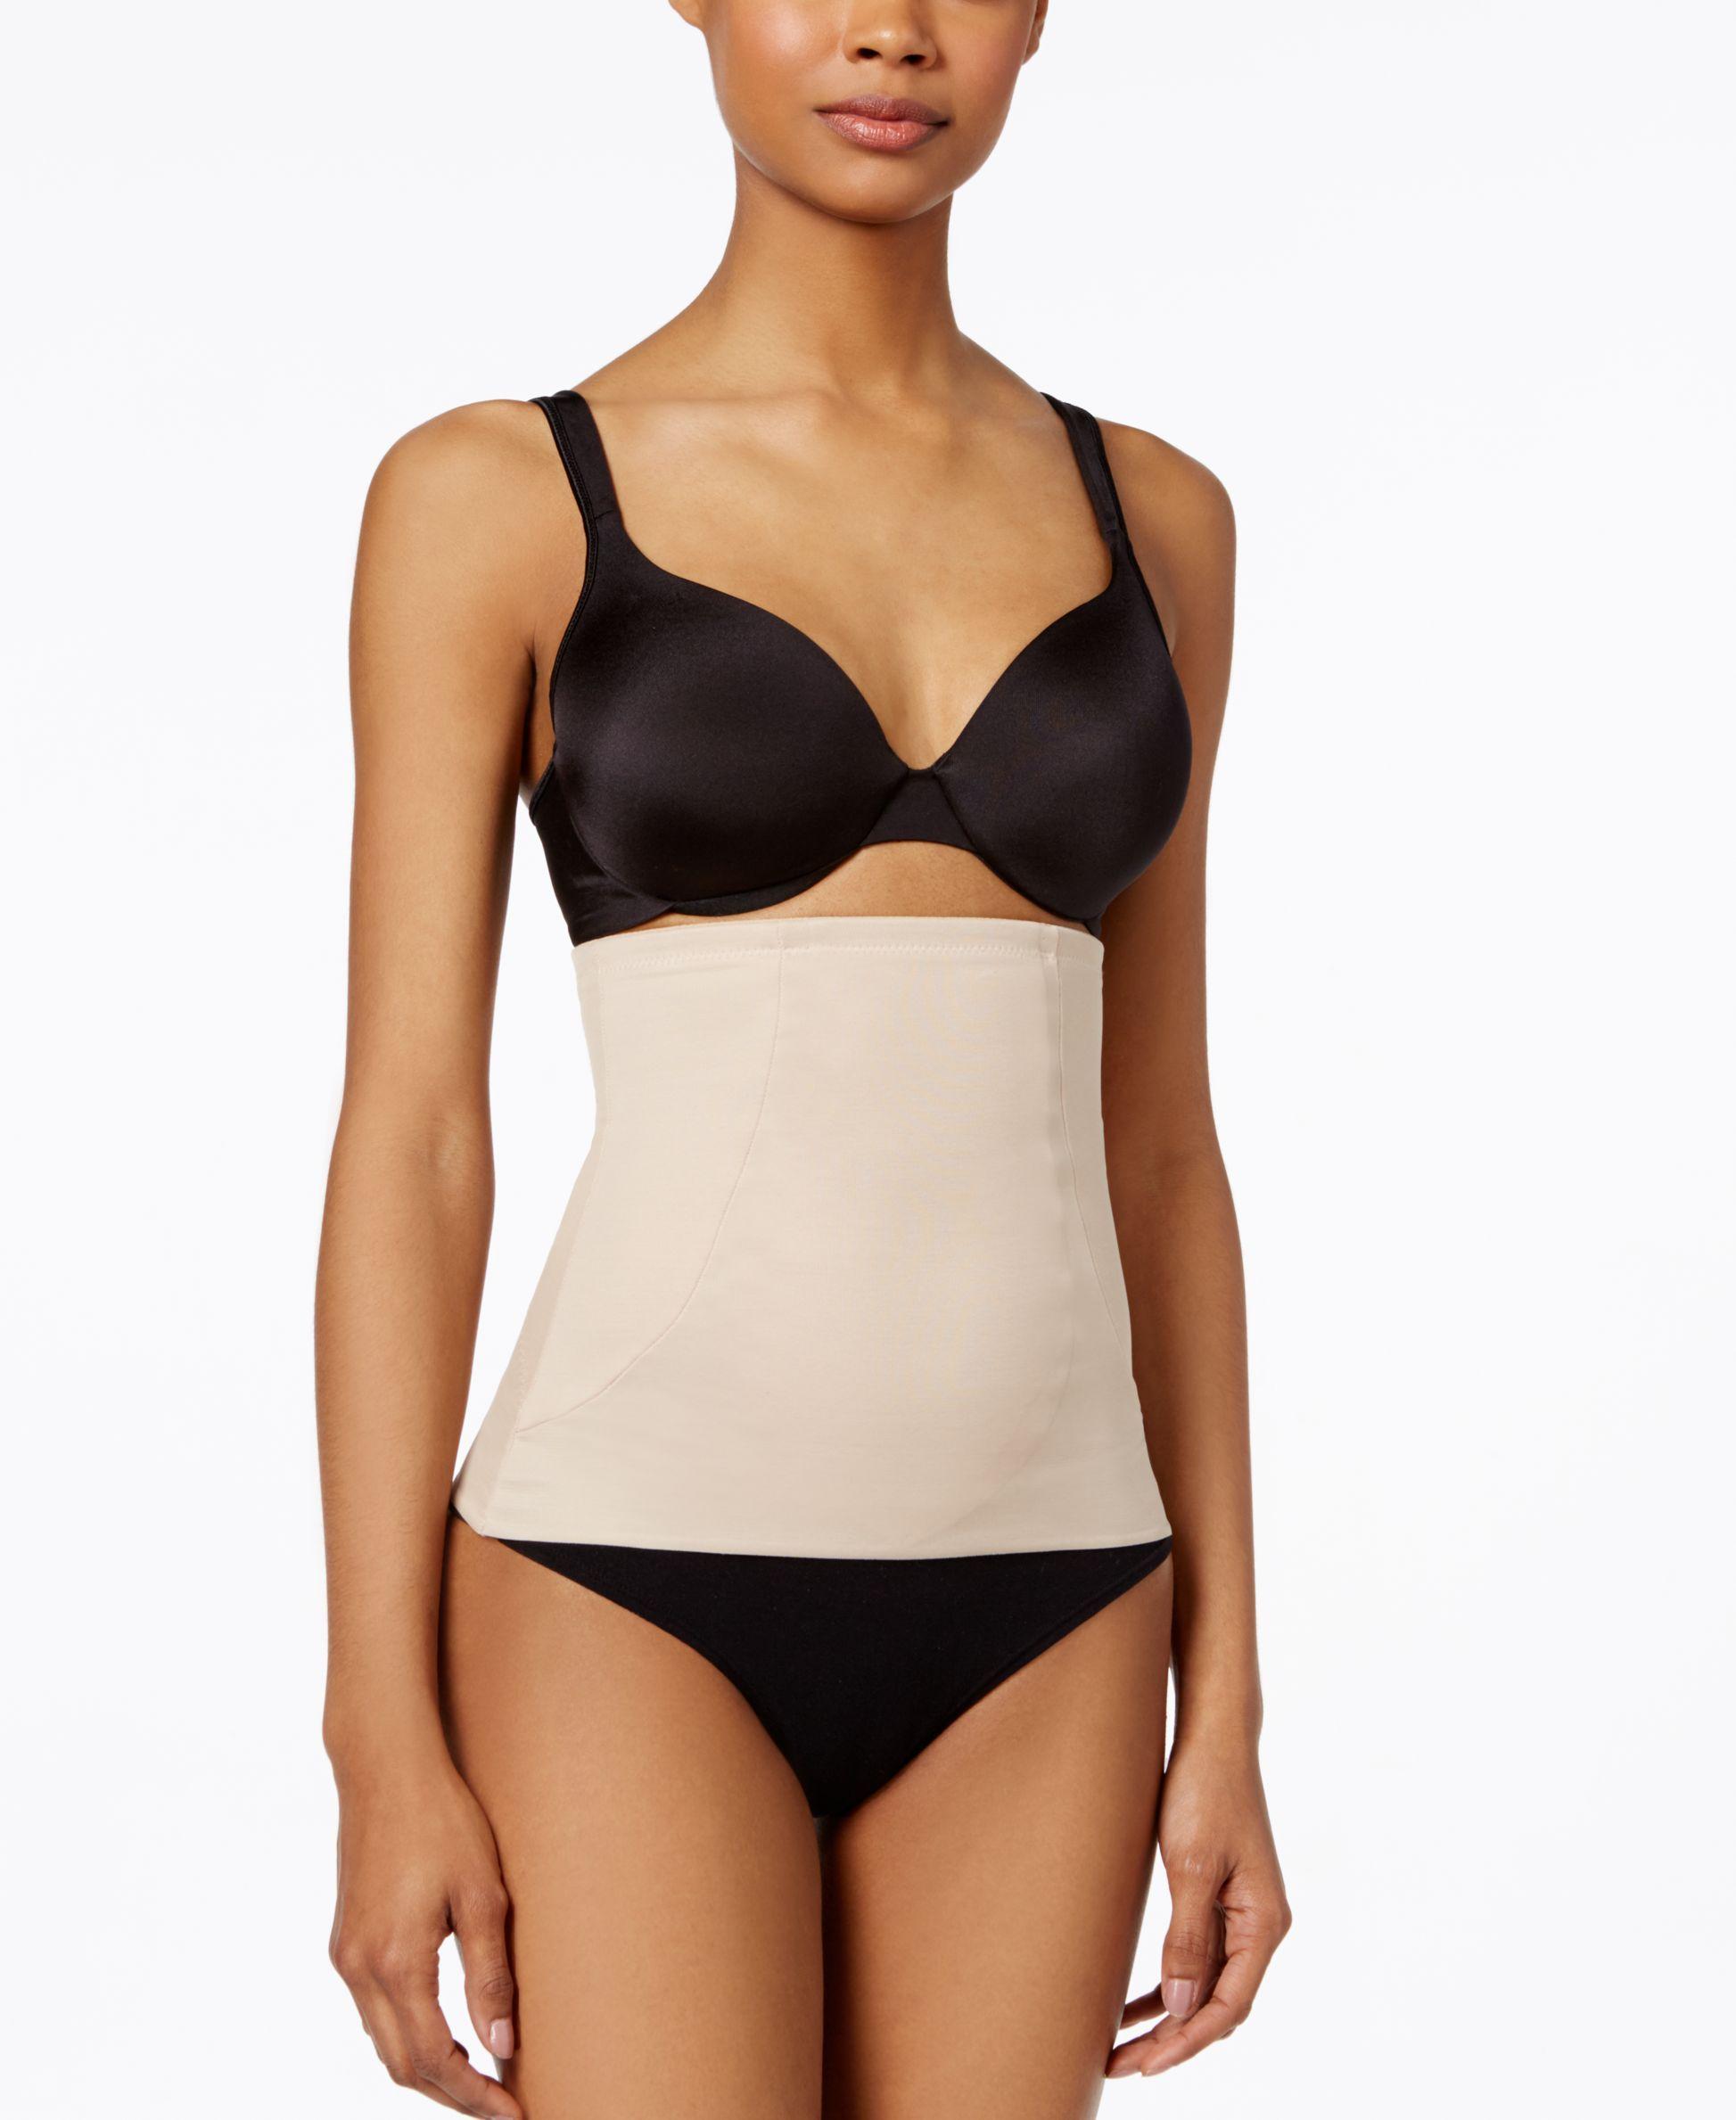 58fc9cd8f Women s Shape Away Extra-Firm Tummy-Control Waist Cincher 2913 ...